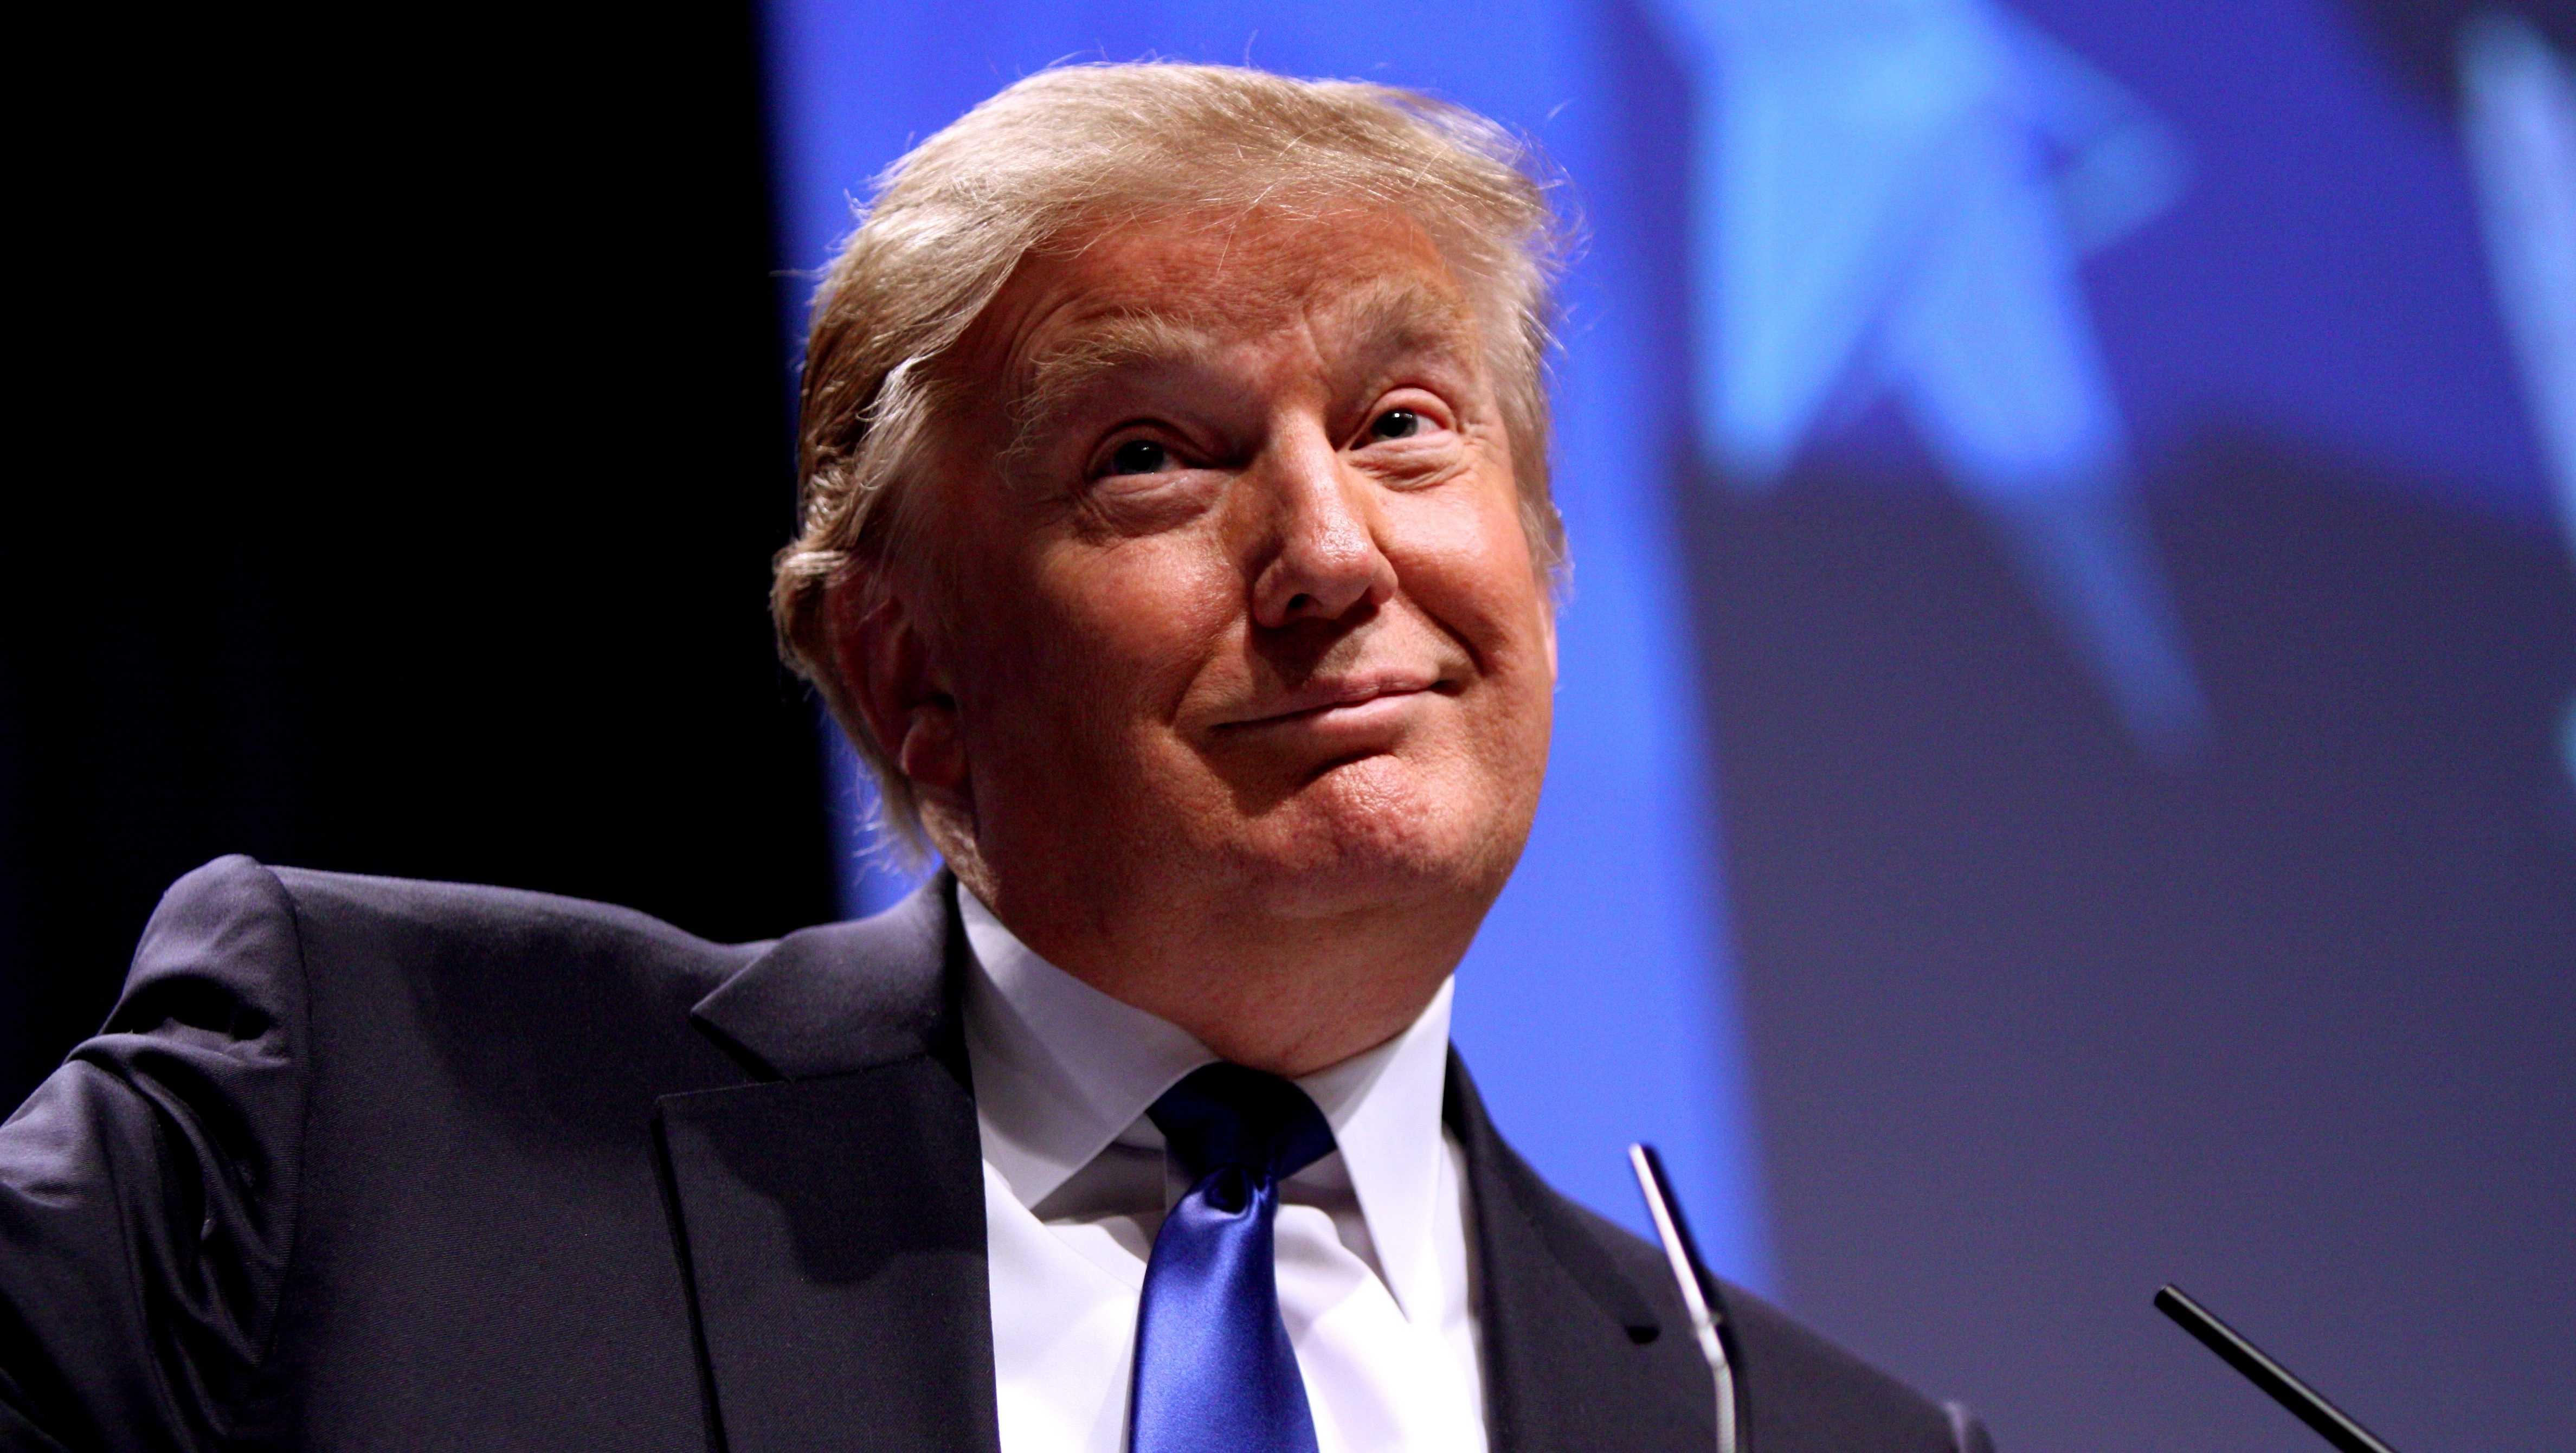 Photo: Donald Trump